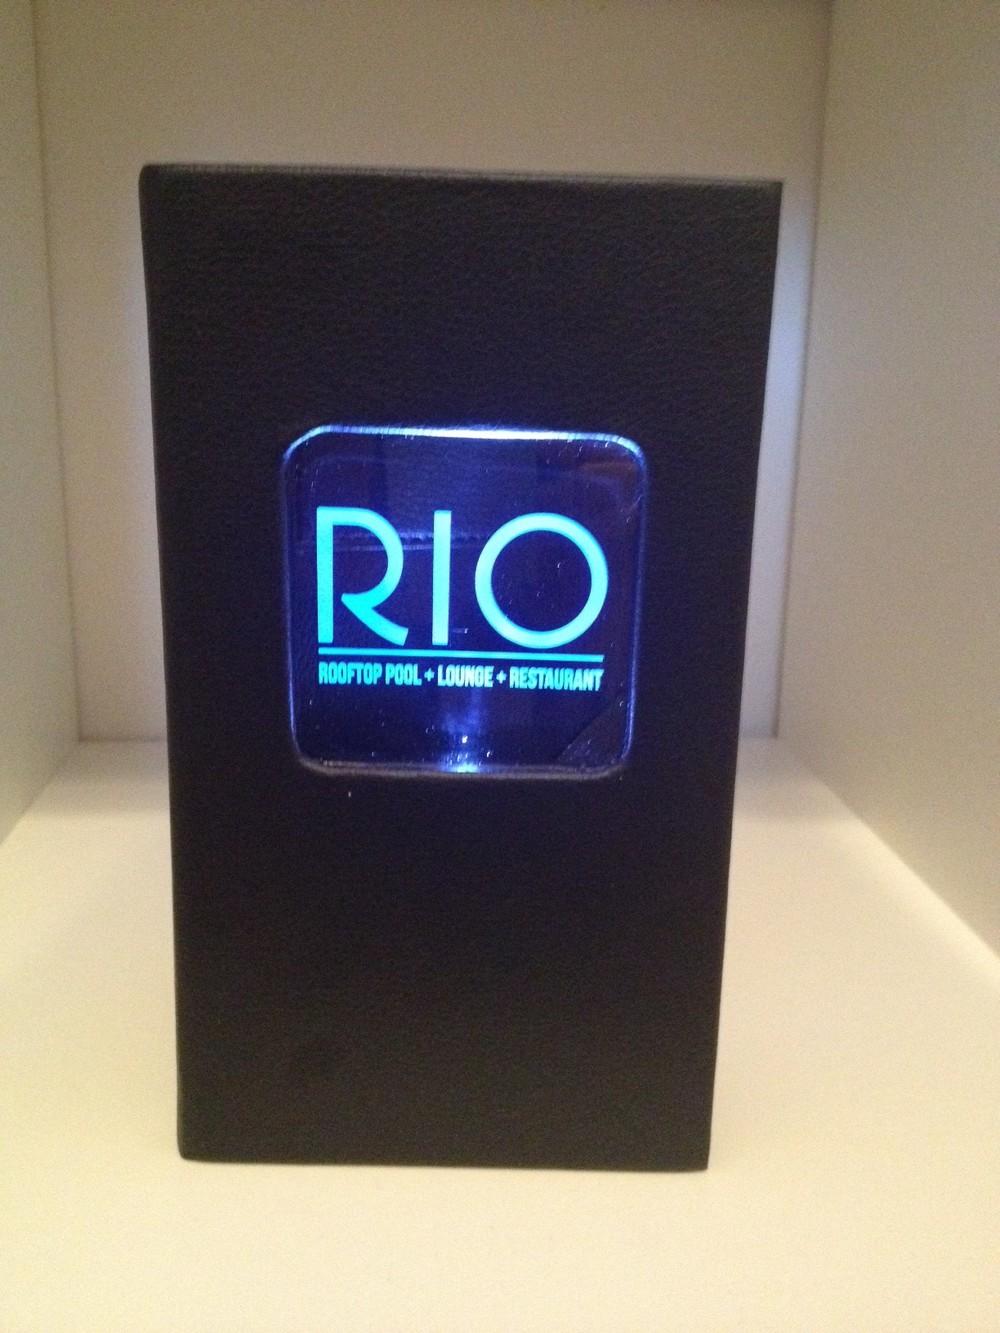 Rio-Pic-Blue.jpg